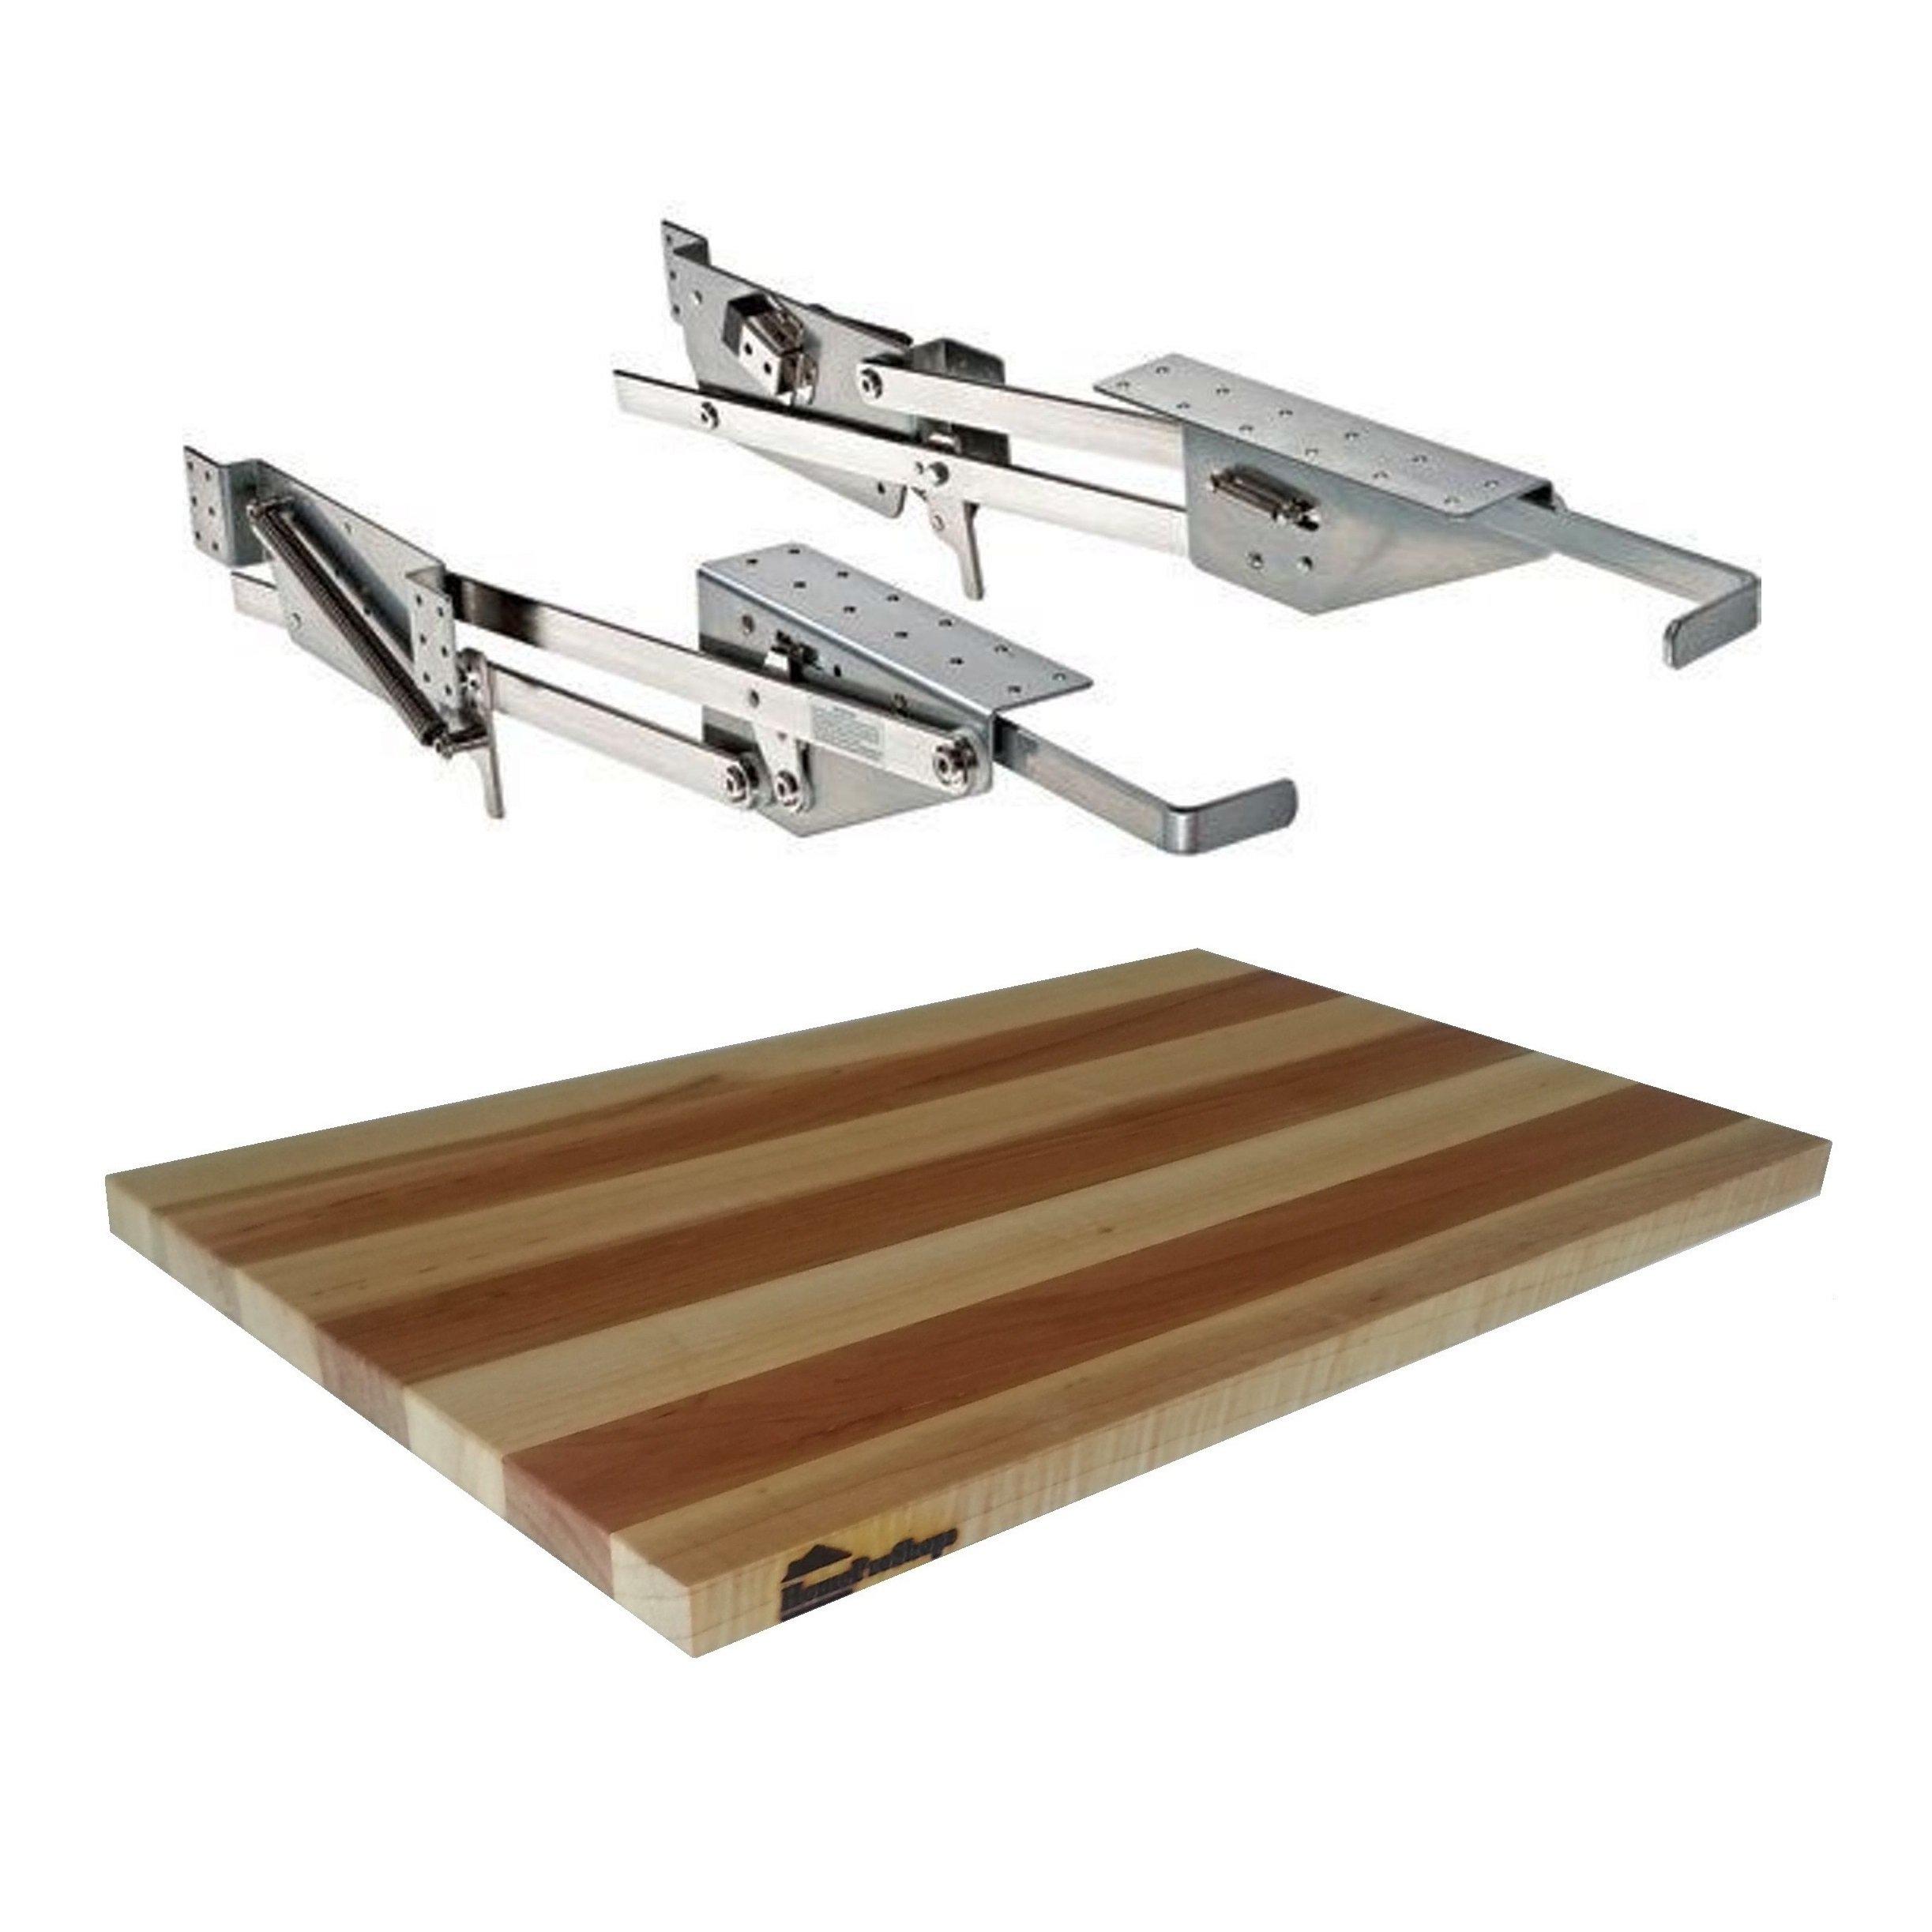 Rev-A-Shelf - RAS-ML-HDCR - Full Height Base Cabinet Heavy Duty Mixer Lift - Includes 3/4'' x 12'' x 19'' Shelf Platform for 18'' width Base Cabinet - Maple Butcher Block - Trimmable